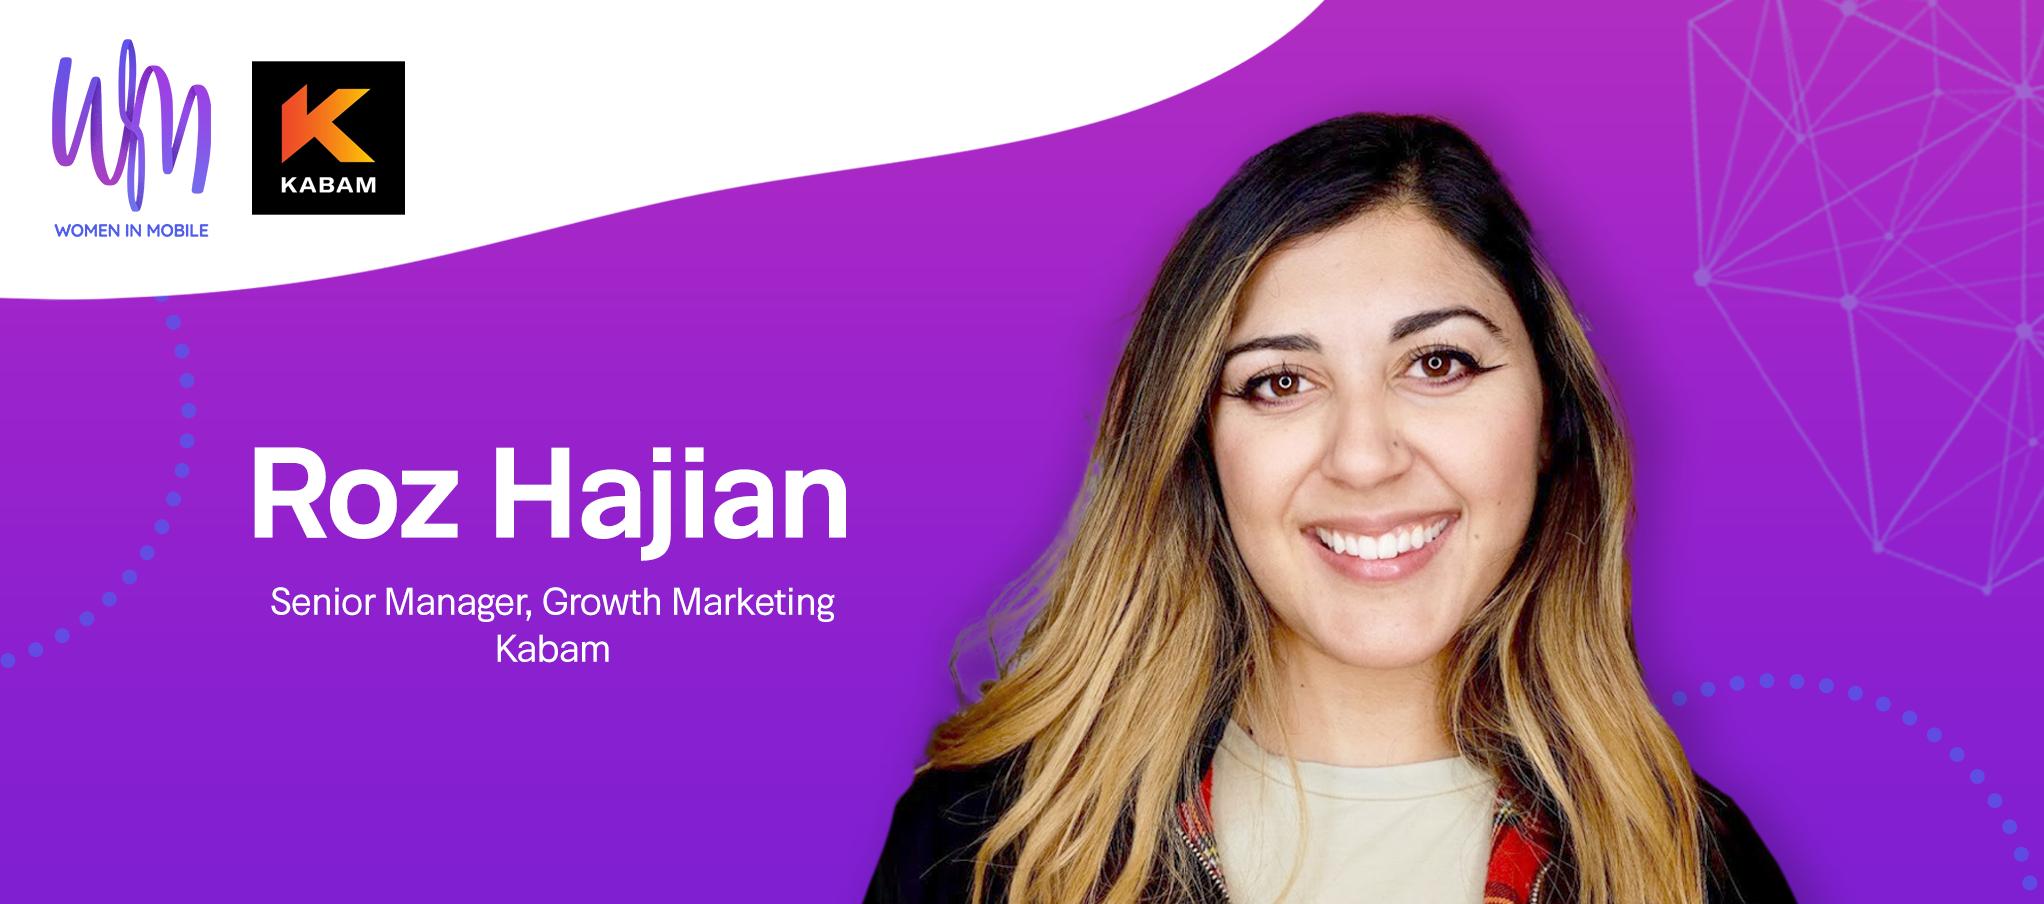 Roz Hajian, Senior Manager, Growth Marketing at Kabam at Aarki's Women in Mobile series